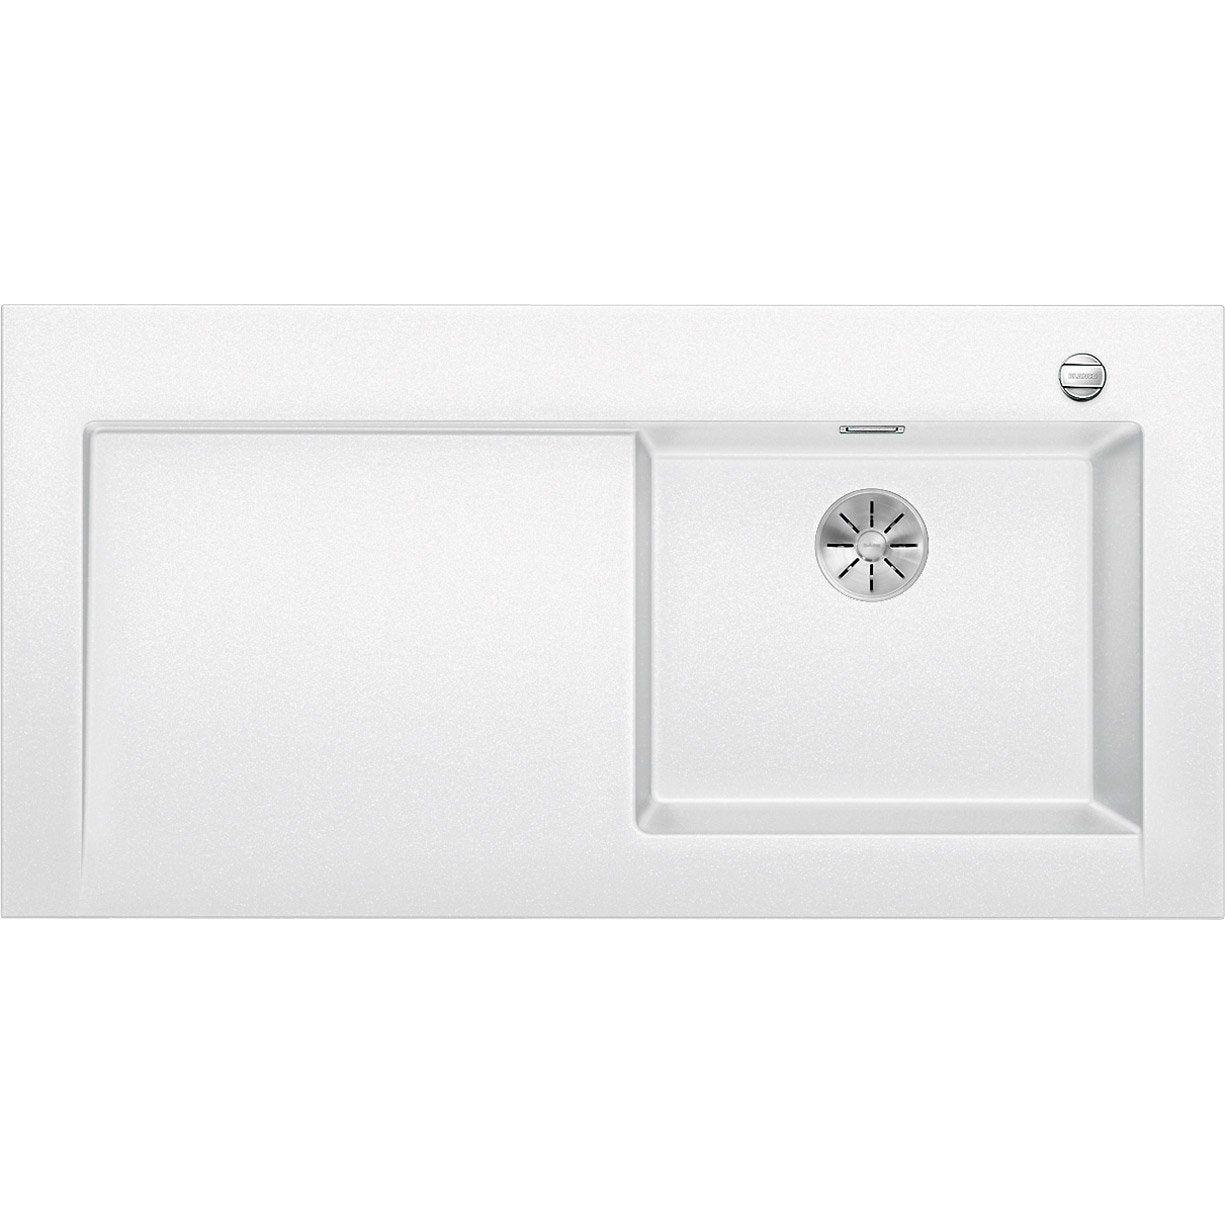 Evier à Encastrer Granit Blanc Blanco Modex M 60 1 Bac Avec